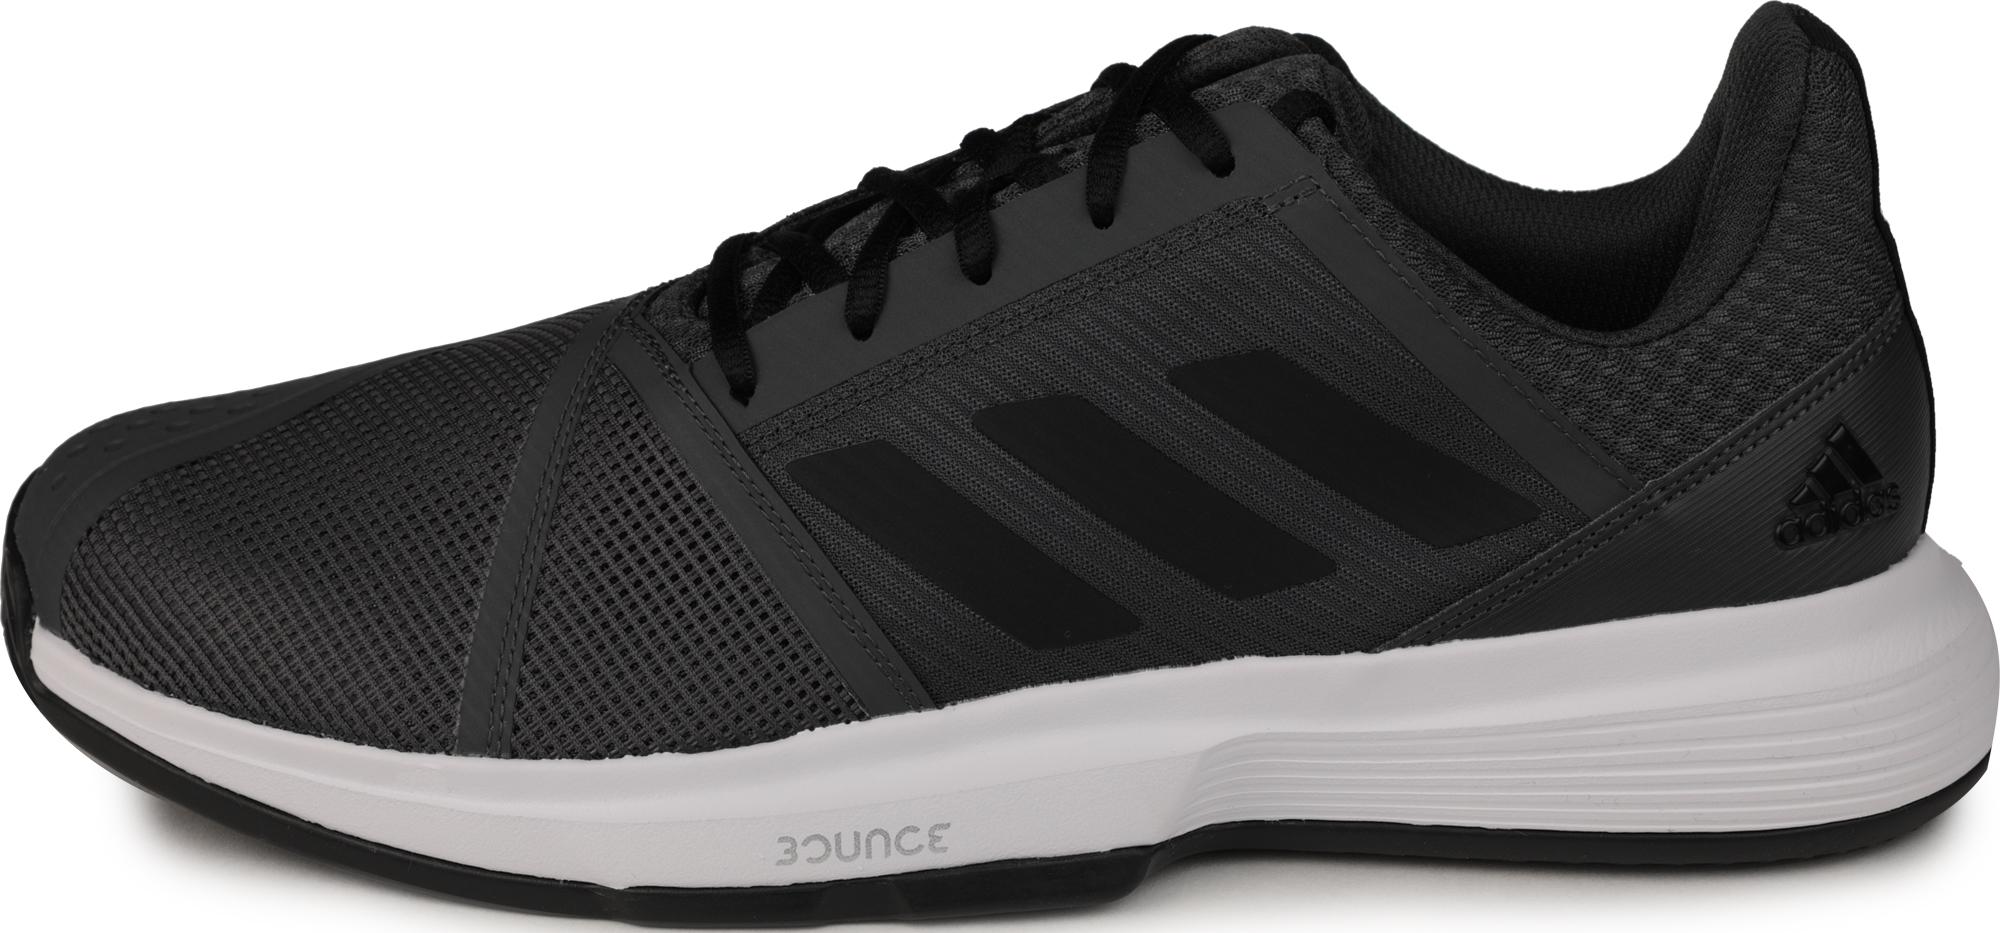 Adidas Кроссовки мужские Adidas CourtJam Bounce Clay, размер 43 adidas кроссовки мужские adidas bounce размер 40 5